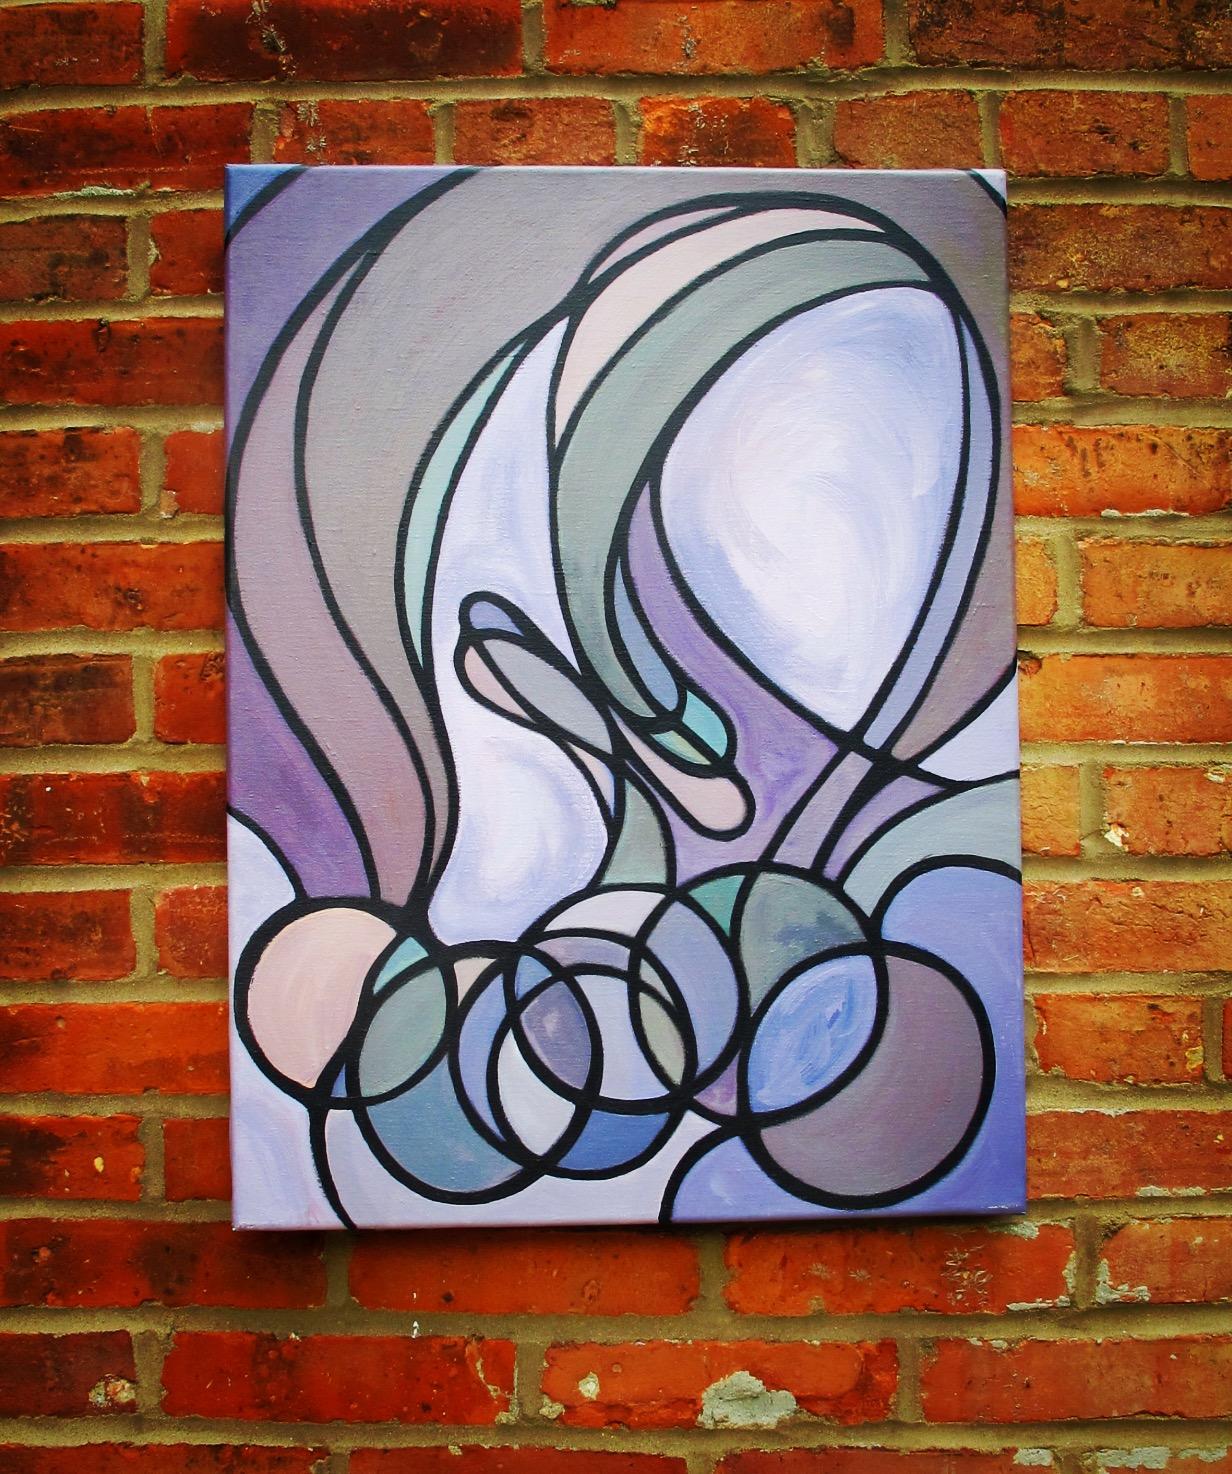 """Alterations"", mixed media painting"